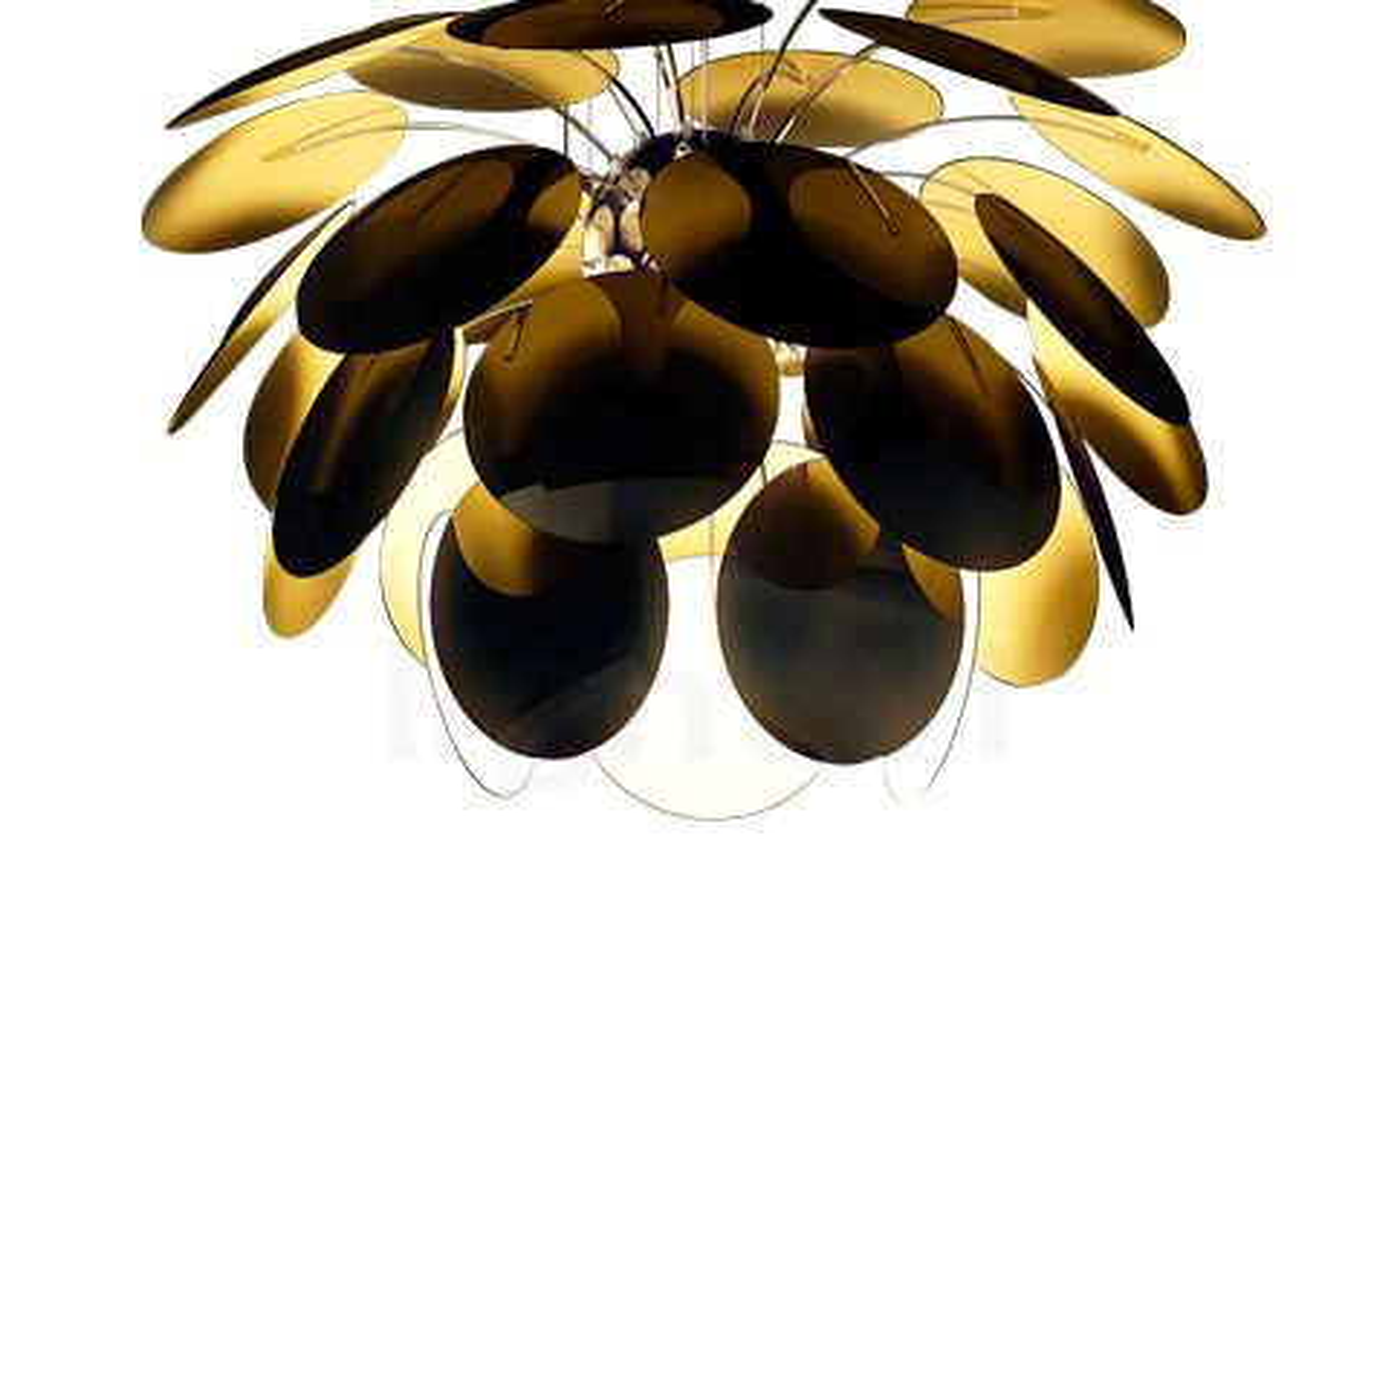 deckenlampe schwarz gold beautiful in schwarzgold deckenlampe choke with deckenlampe schwarz. Black Bedroom Furniture Sets. Home Design Ideas